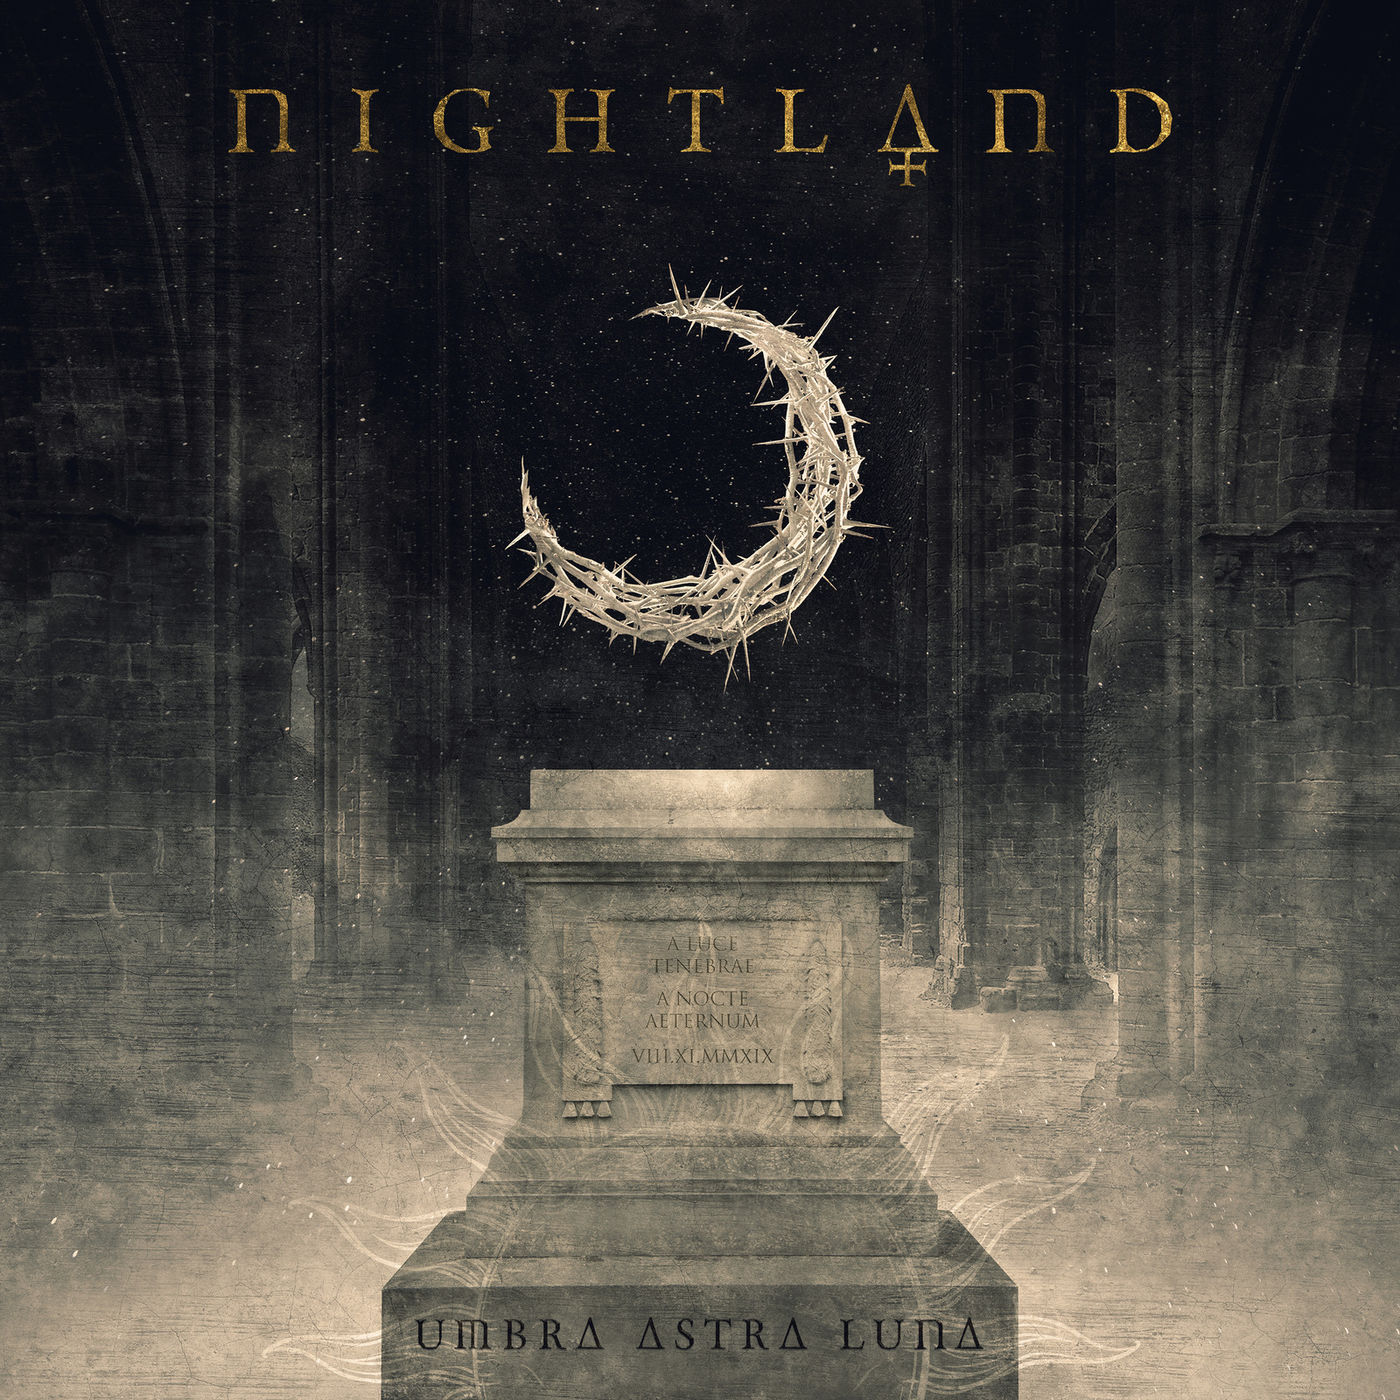 Nightland - Umbra Astra Luna